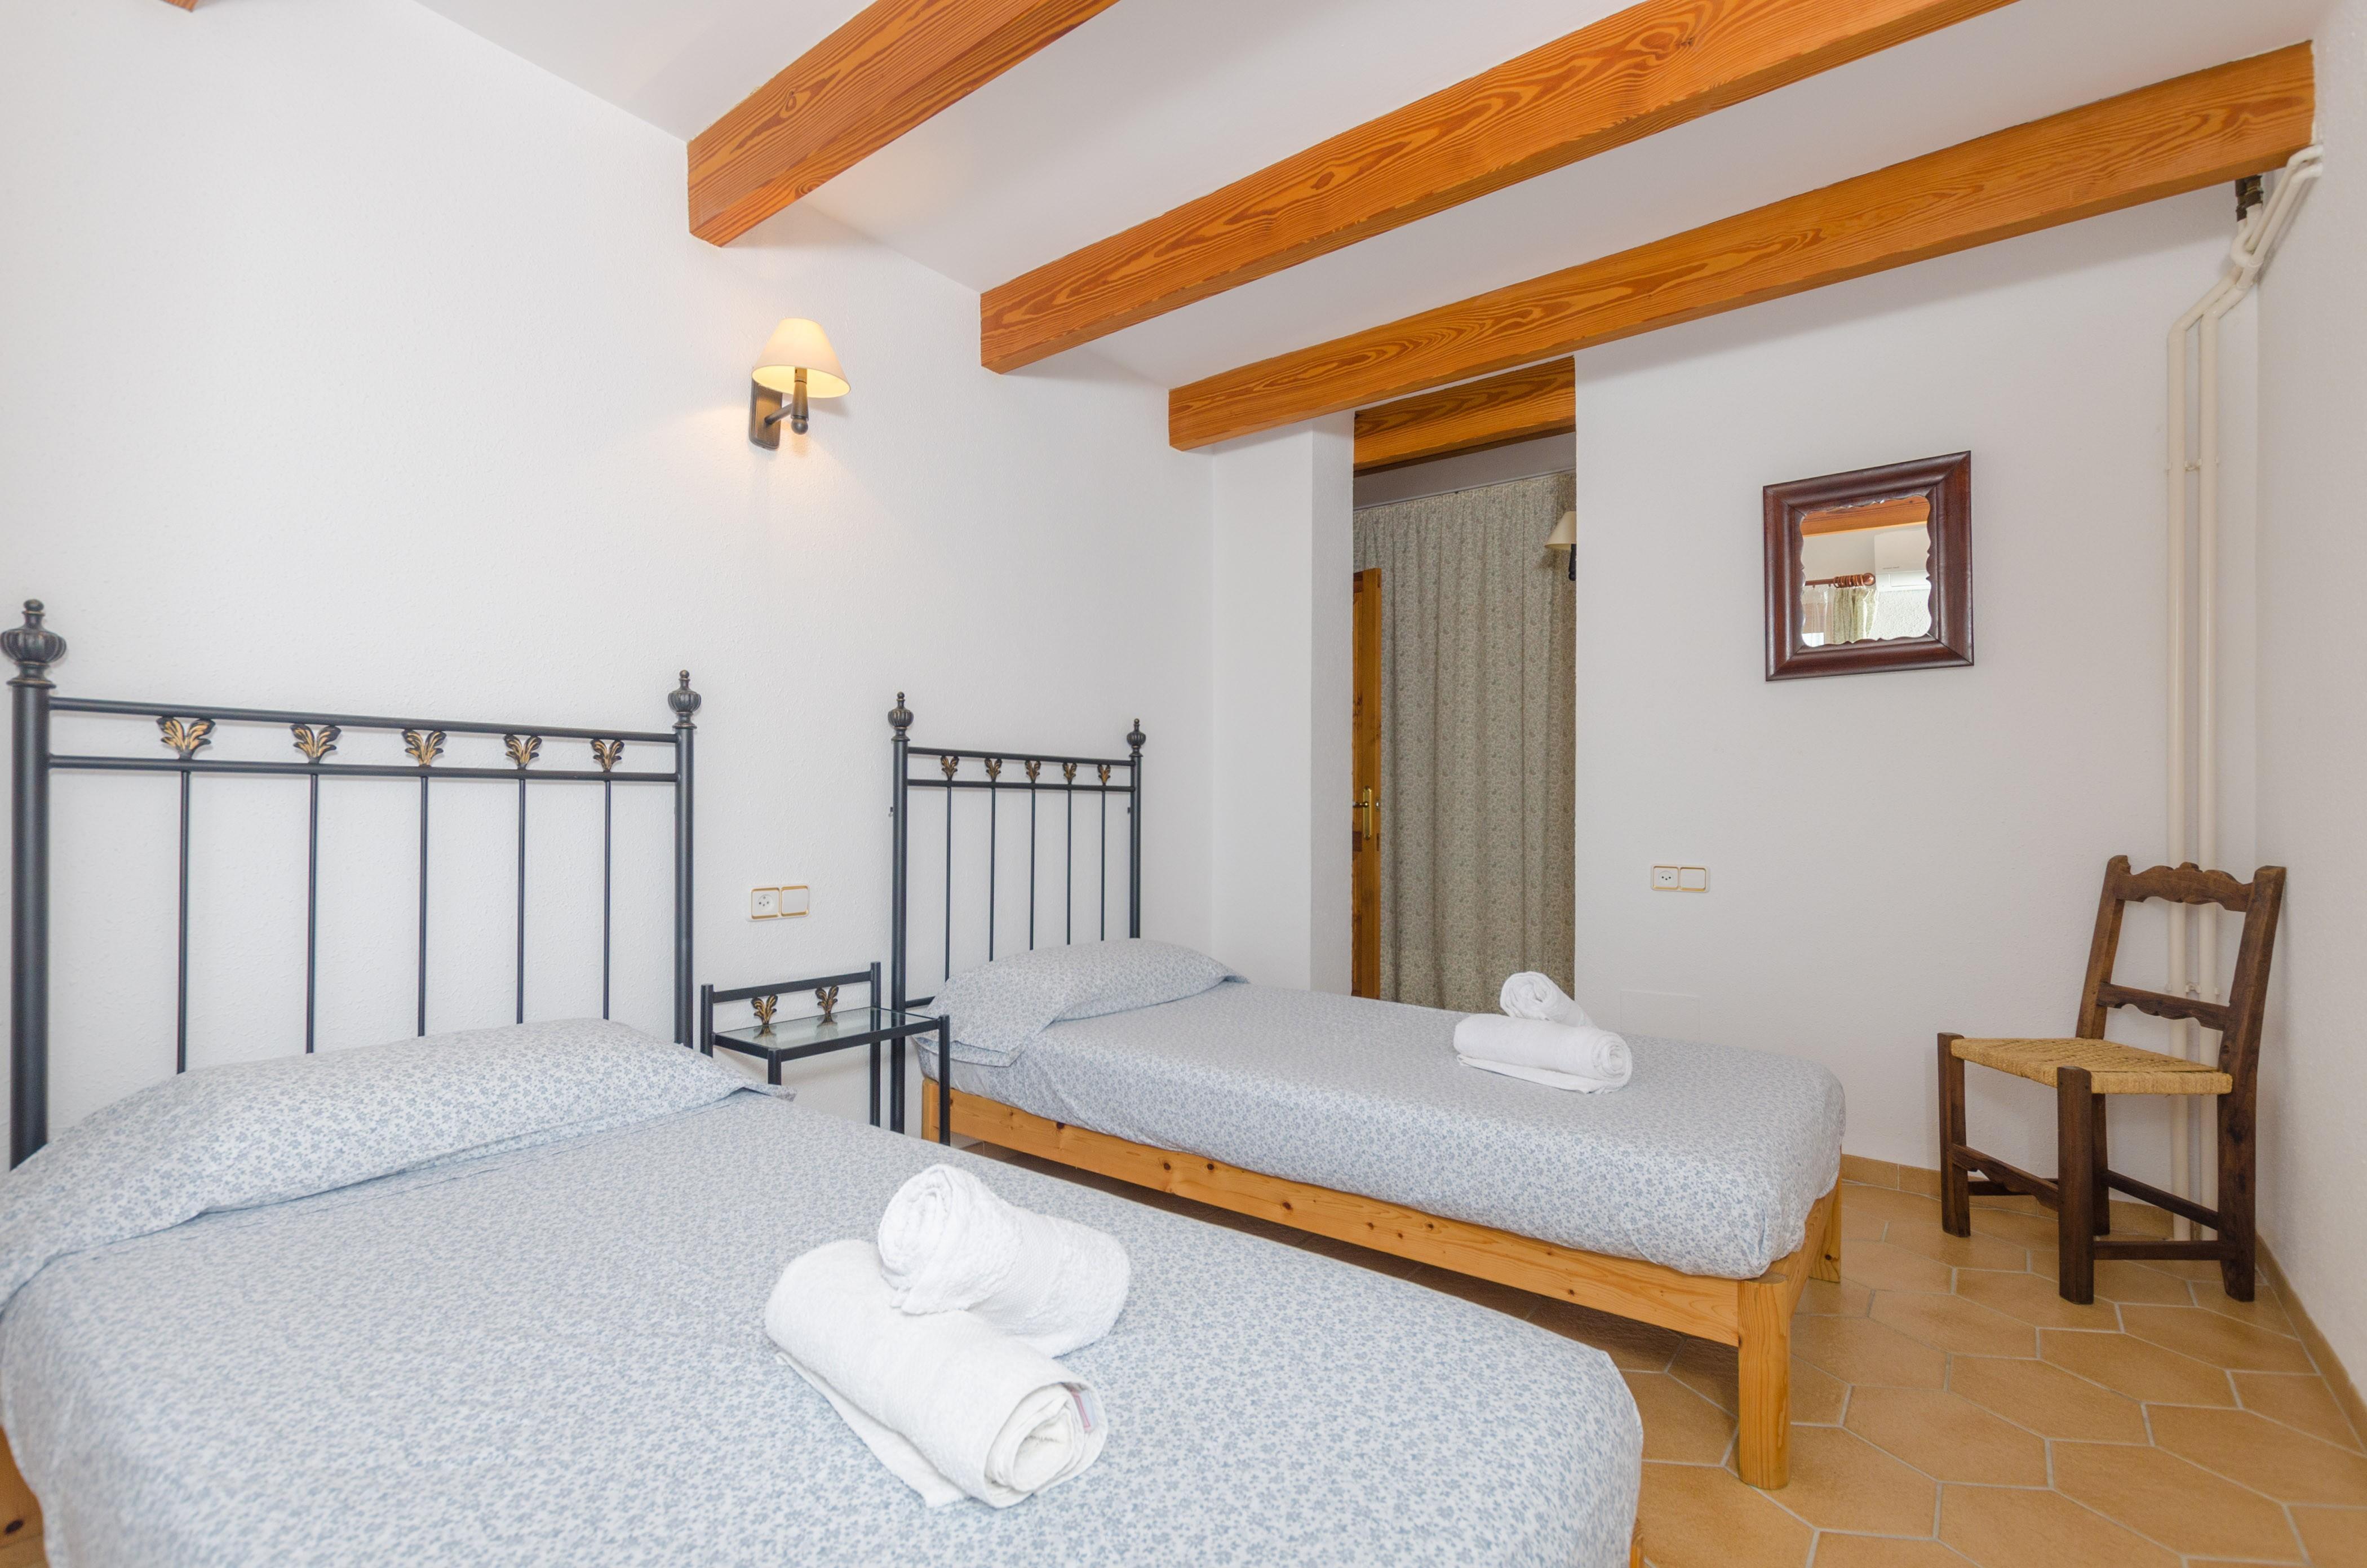 Maison de vacances SA SINIA (2374876), Lloret de Vistalegre, Majorque, Iles Baléares, Espagne, image 34